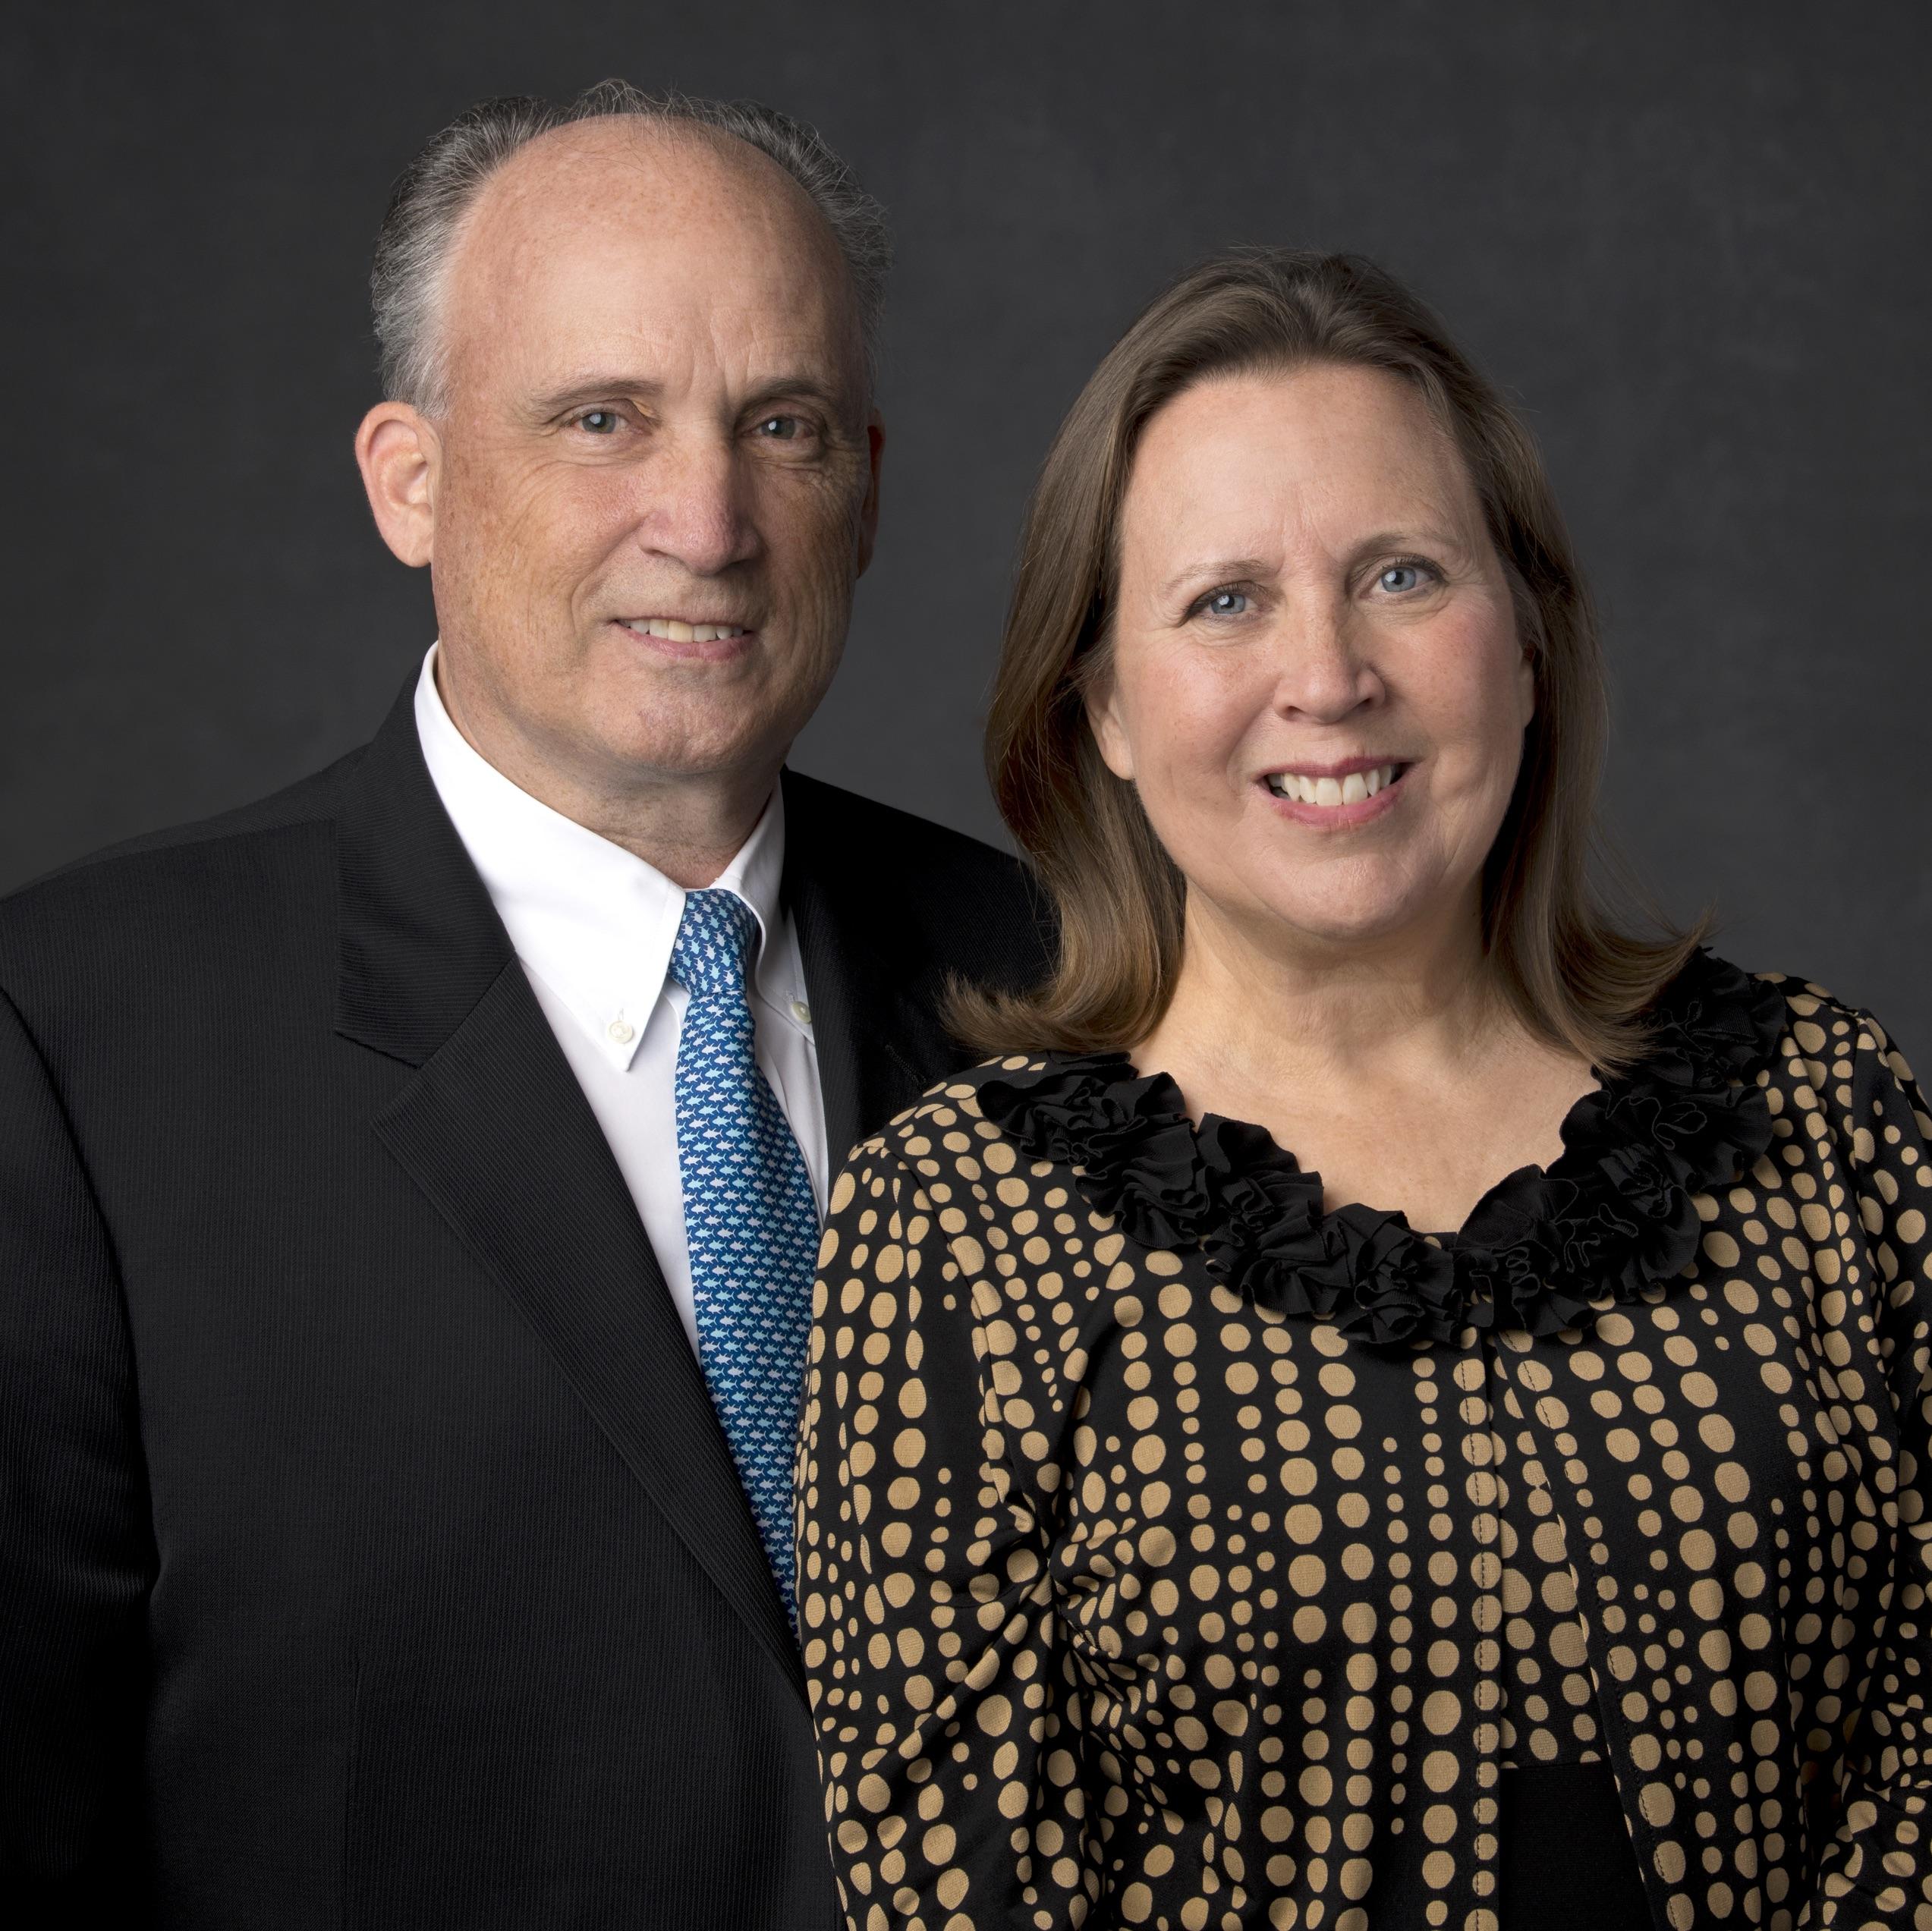 W. Michael Ingalls and Roxanne W. Ingalls